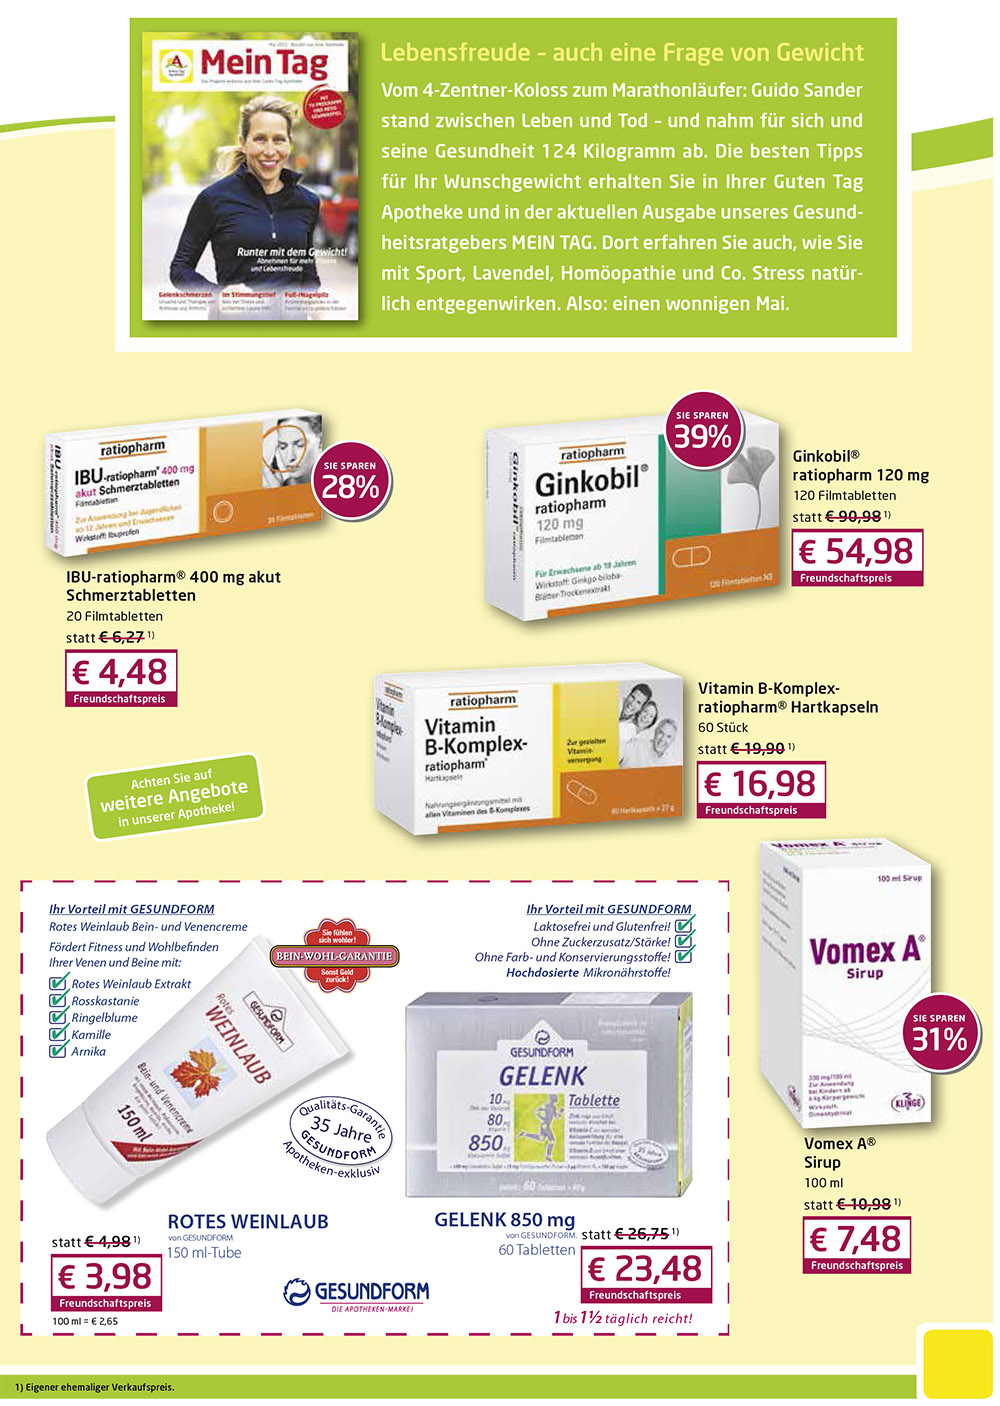 http://www.apotheken.de/fileadmin/clubarea/00000-Angebote/72488_Laizer_Angebote_3.jpg